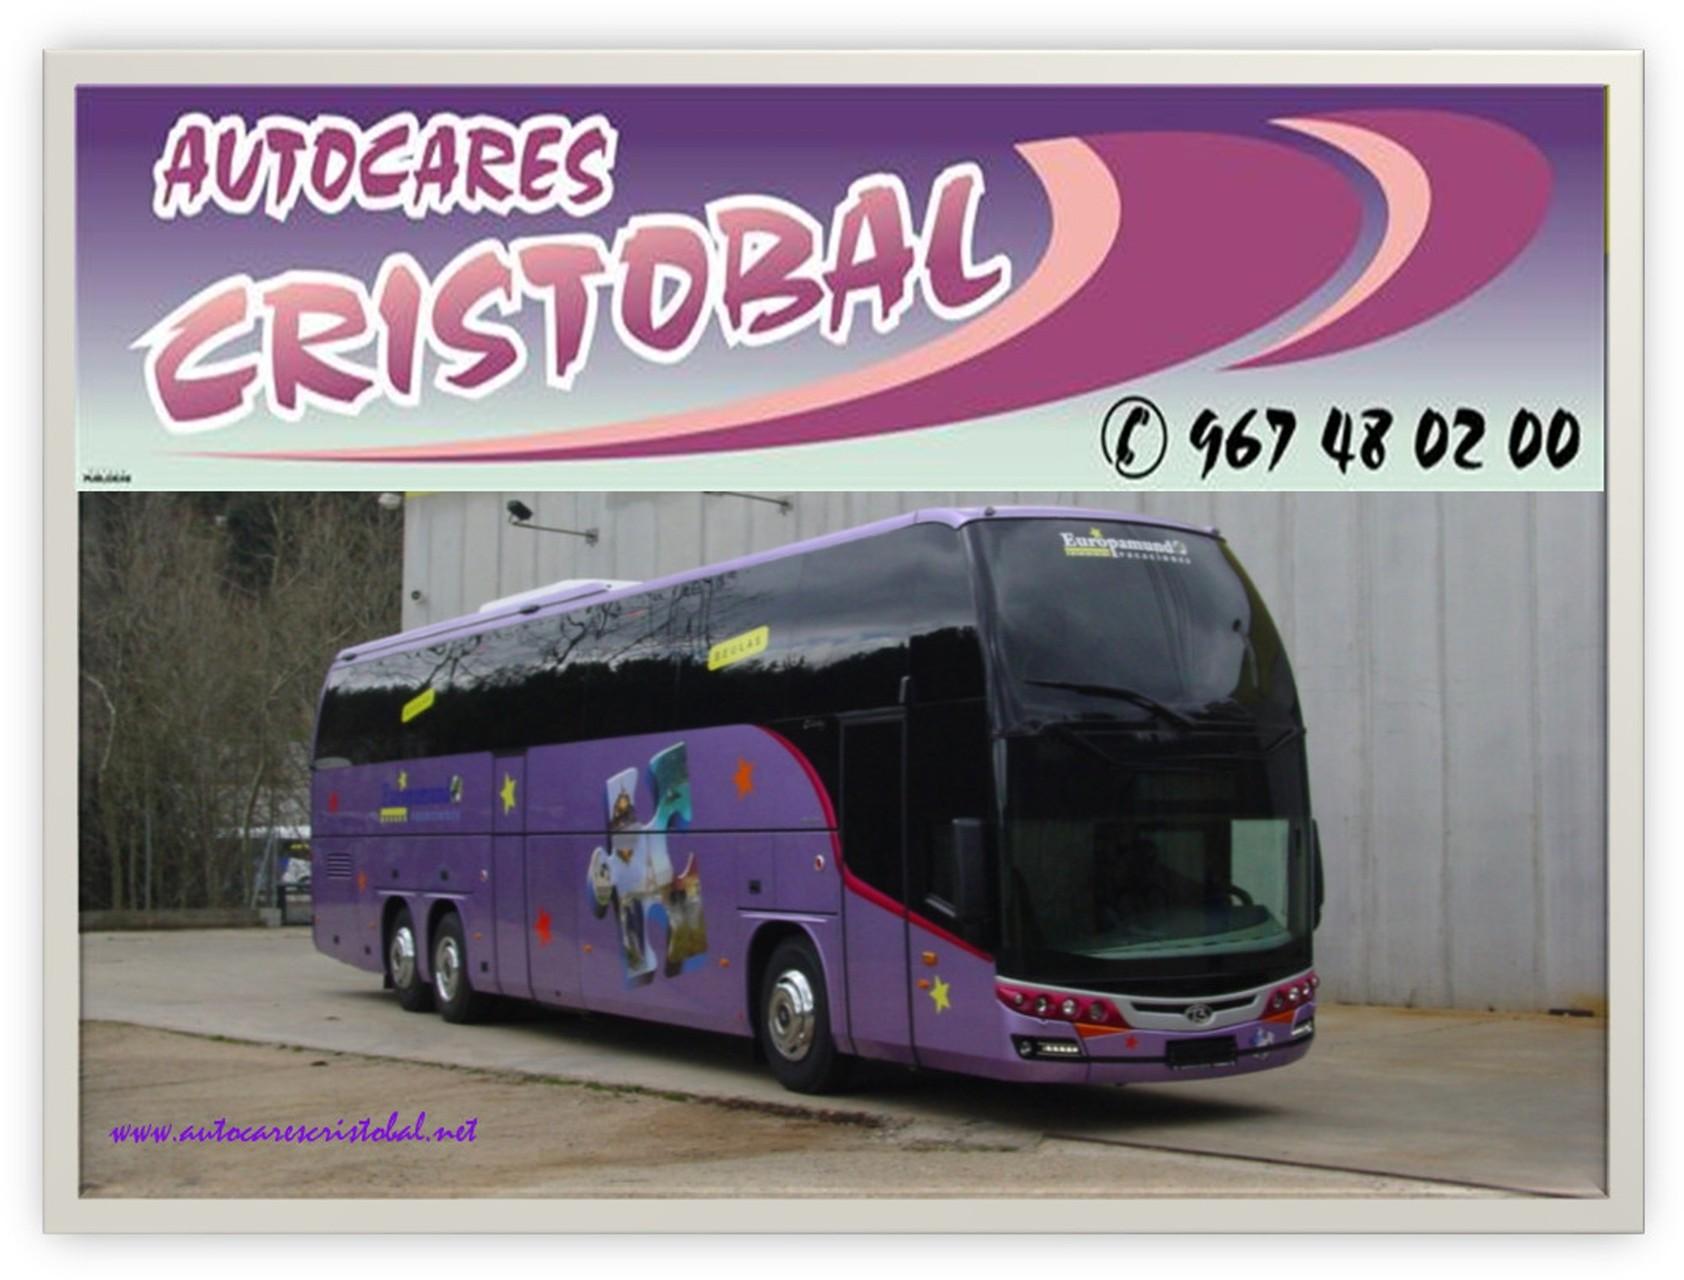 AUTOCARES CRISTOBAL